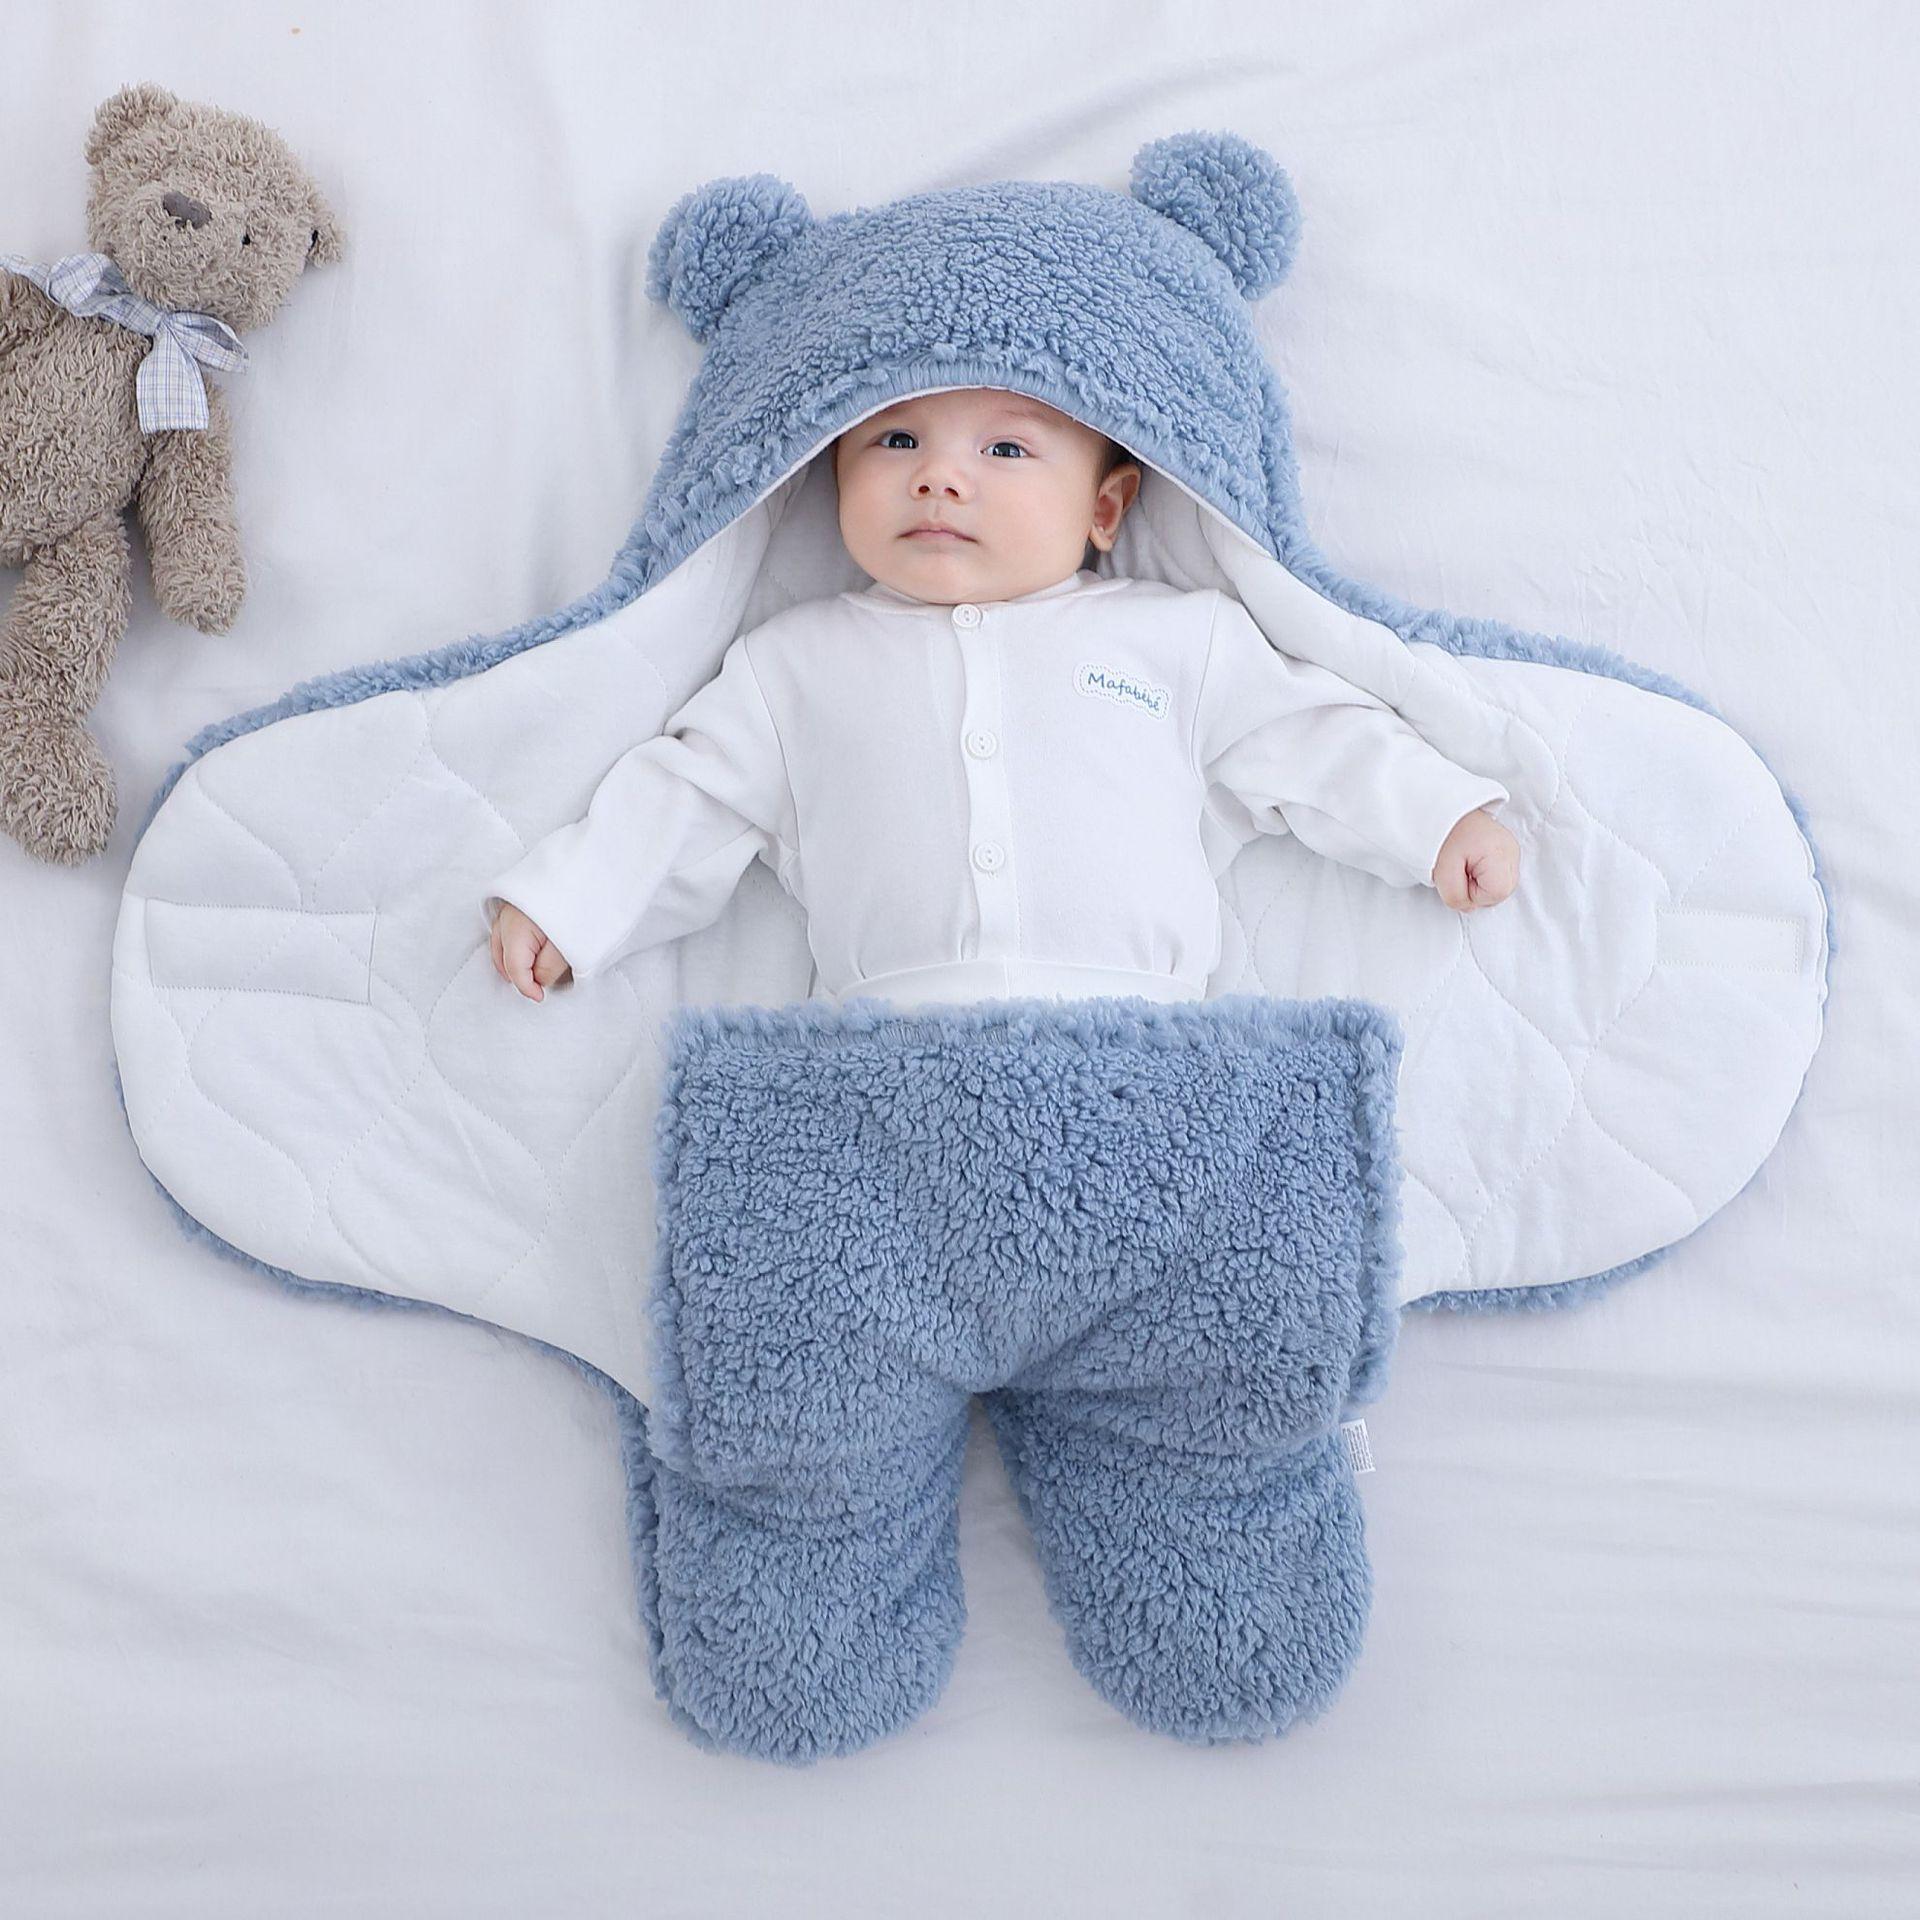 Blanket Swaddle Sleeping-Bag Nursery-Wrap Fleece Fluffy Newborn Infant Baby Girls Boys